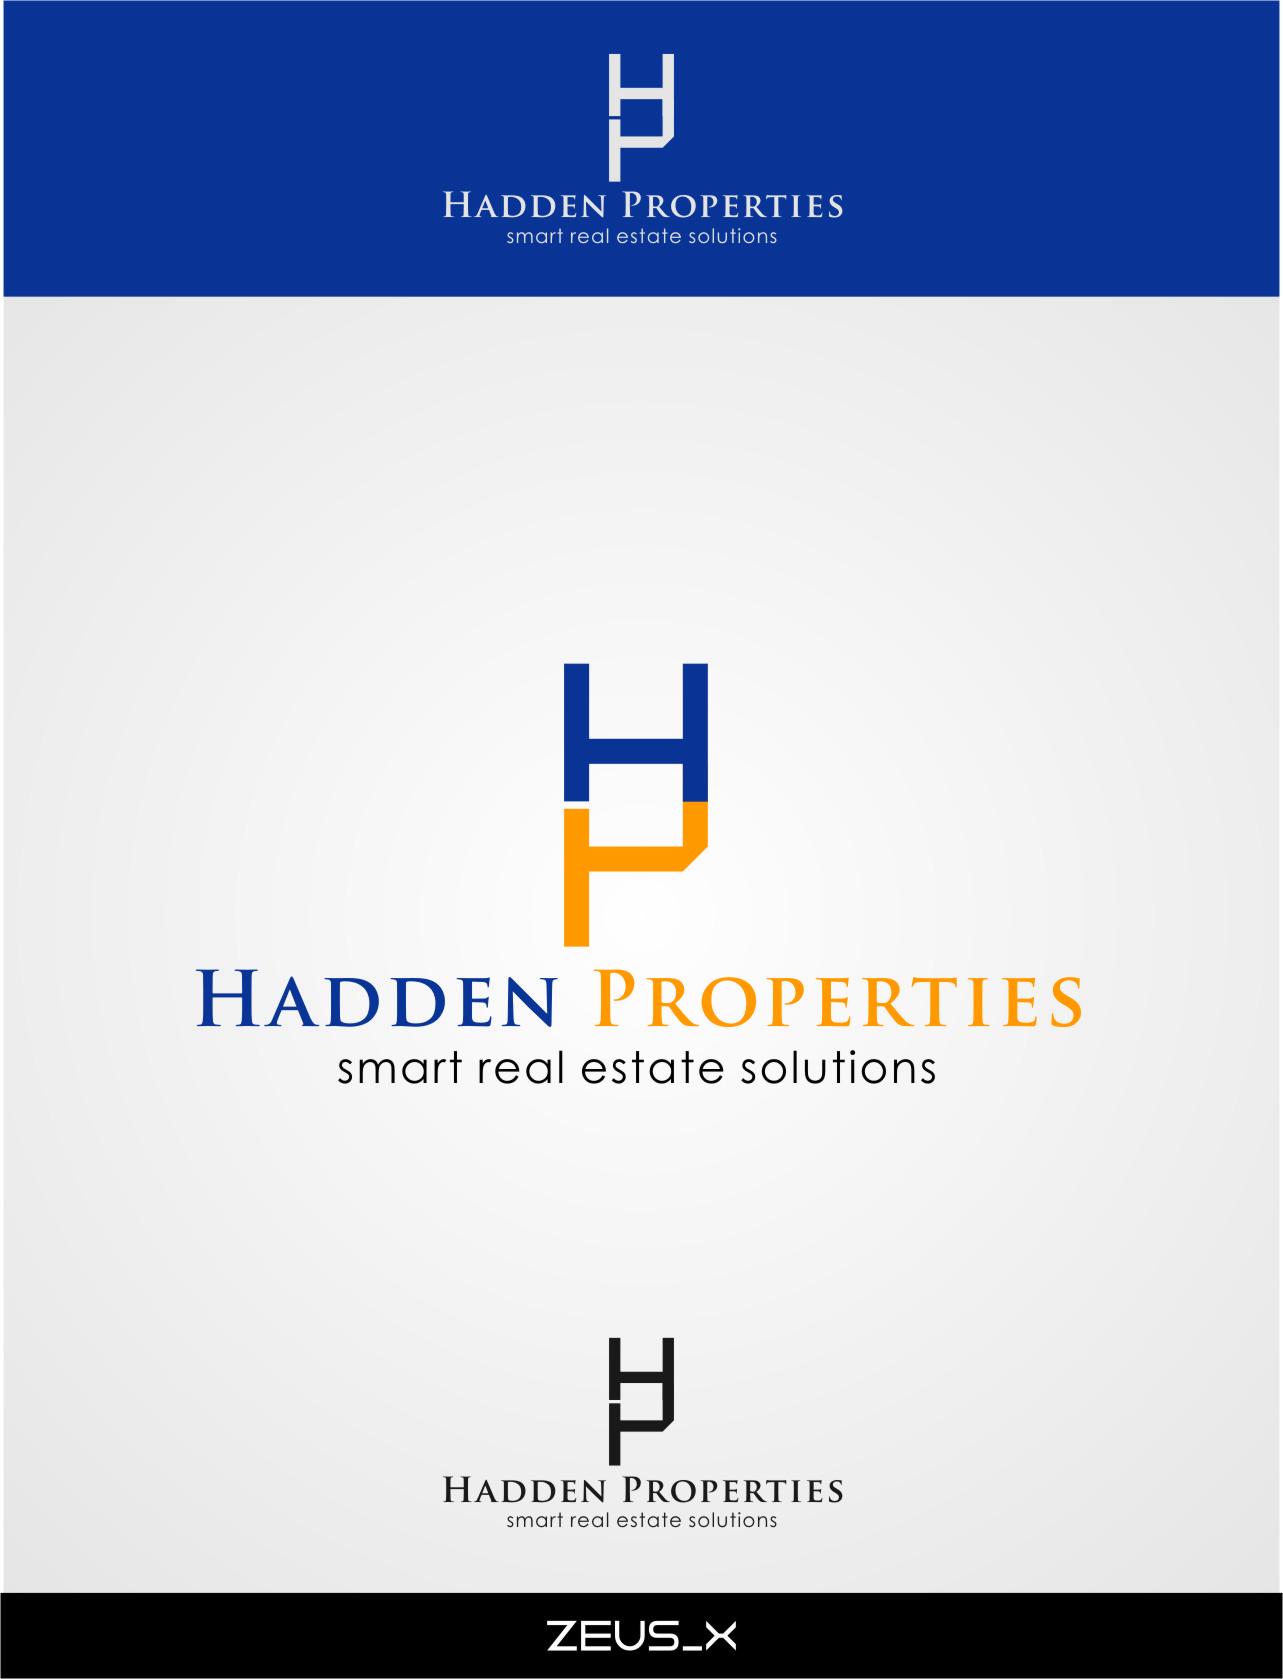 Logo Design by RasYa Muhammad Athaya - Entry No. 121 in the Logo Design Contest Artistic Logo Design for Hadden Properties.